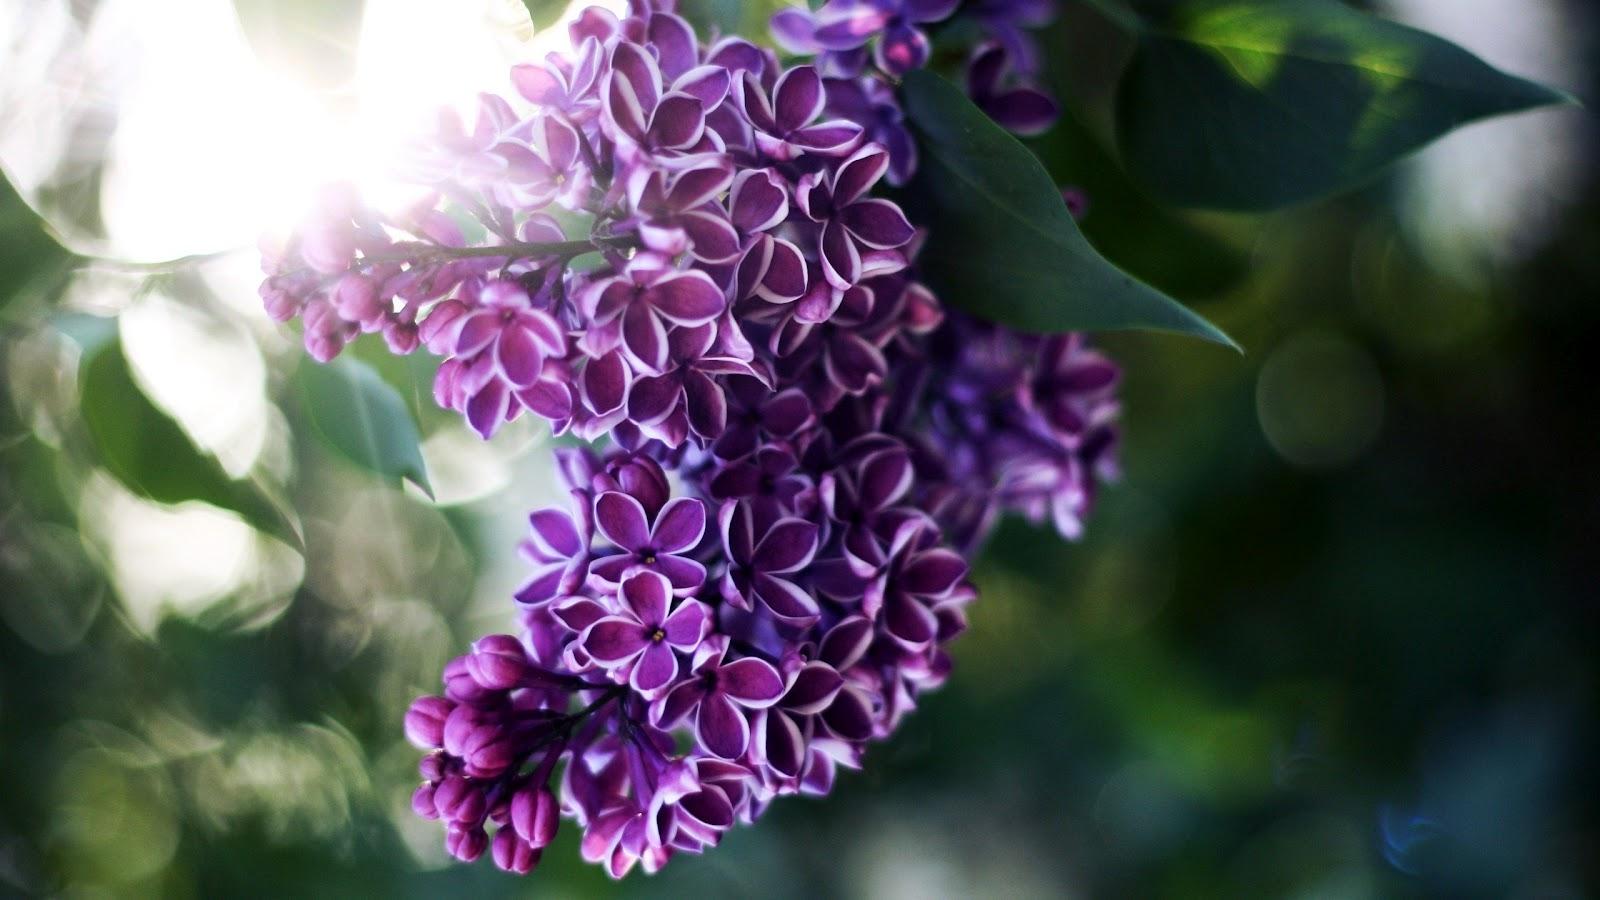 lilac flowers Desktop Wallpaper FULL HD High Definition Wallpapers 1600x900